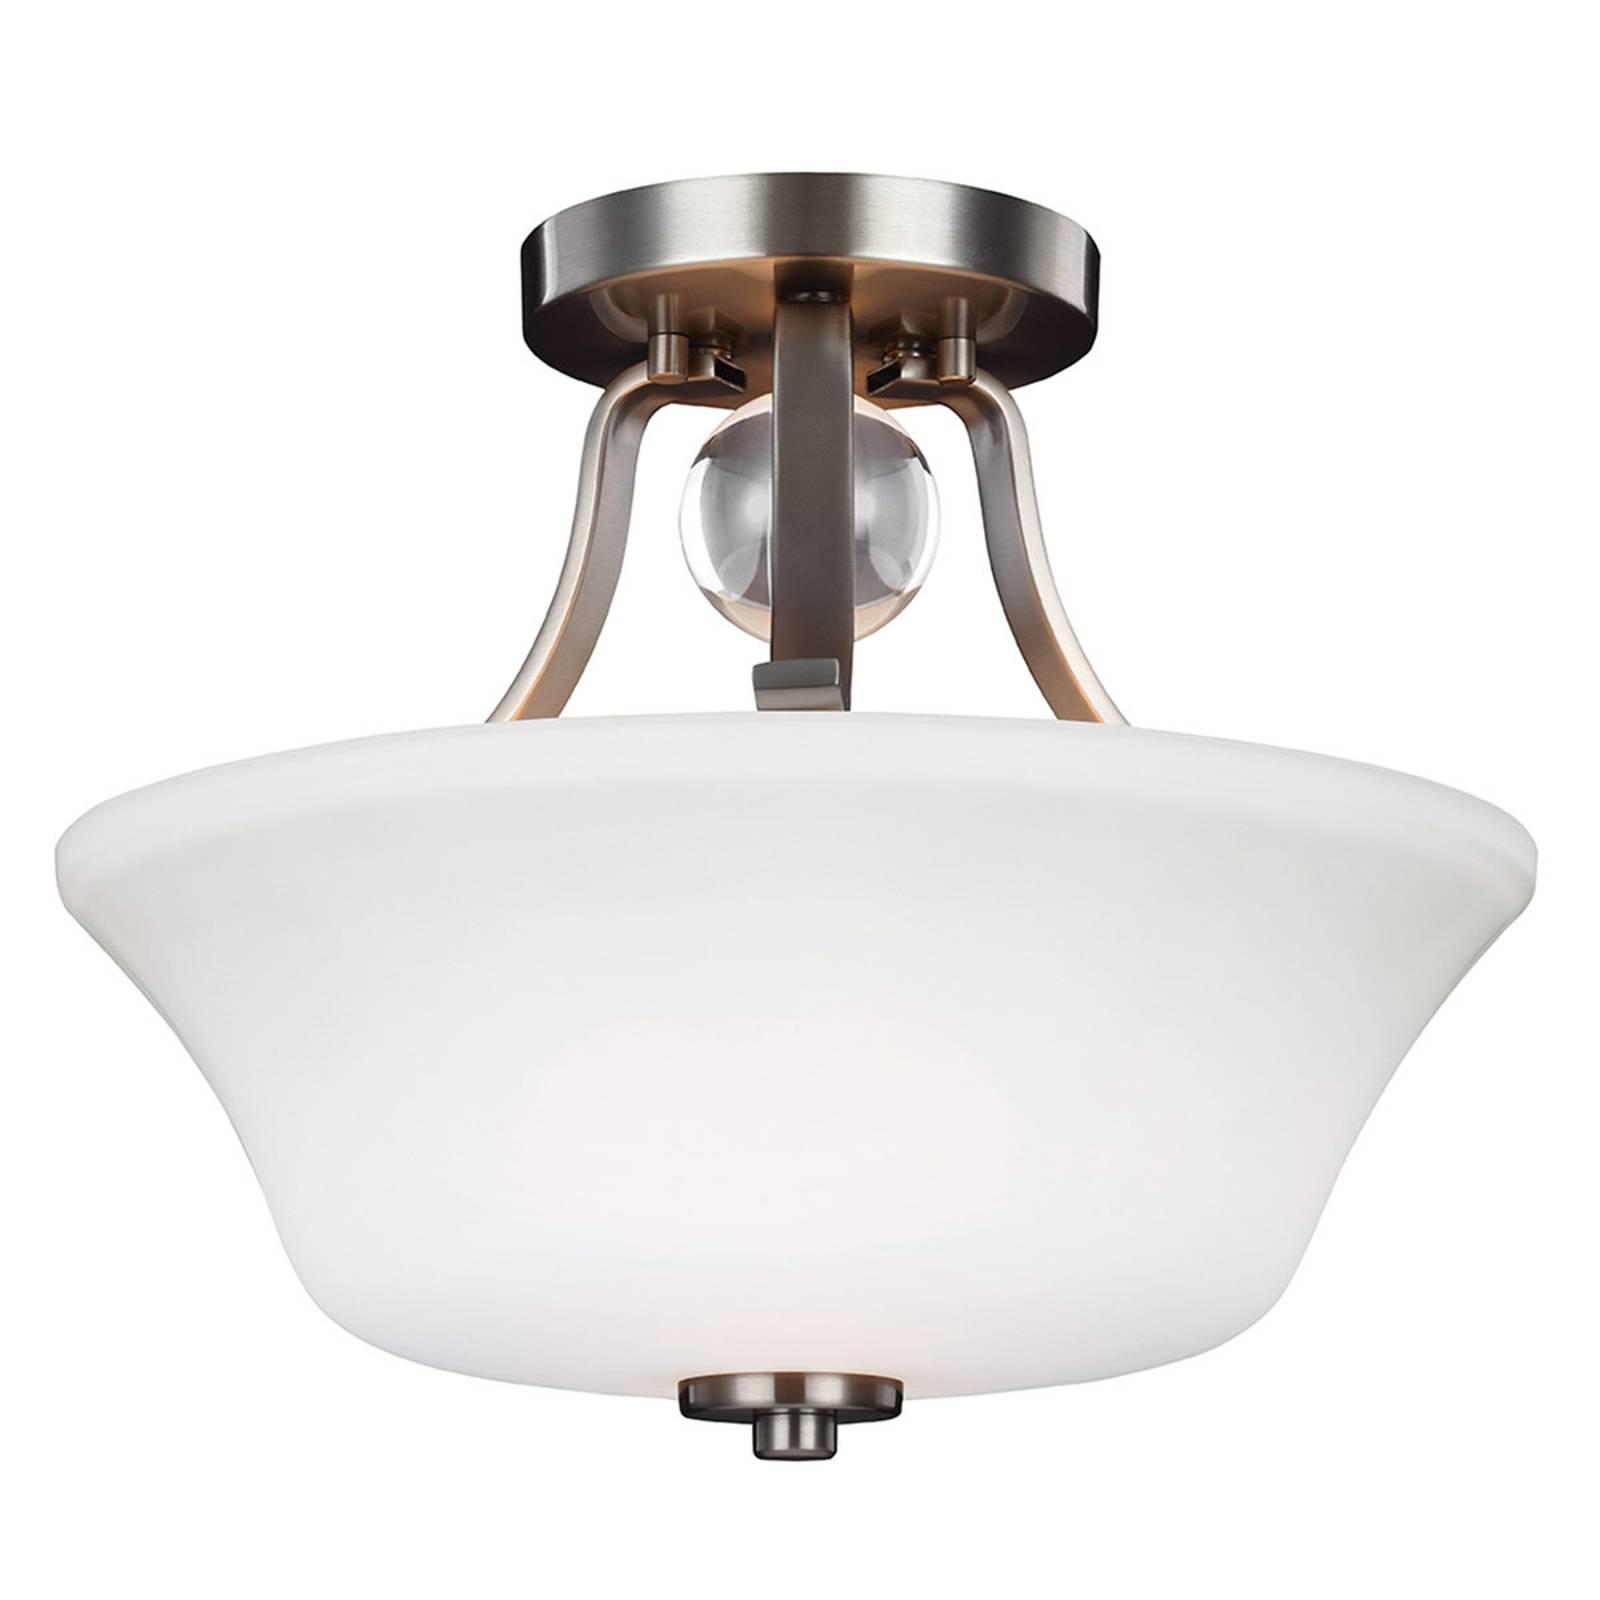 Plafondlamp met afstand Evington, nikkel